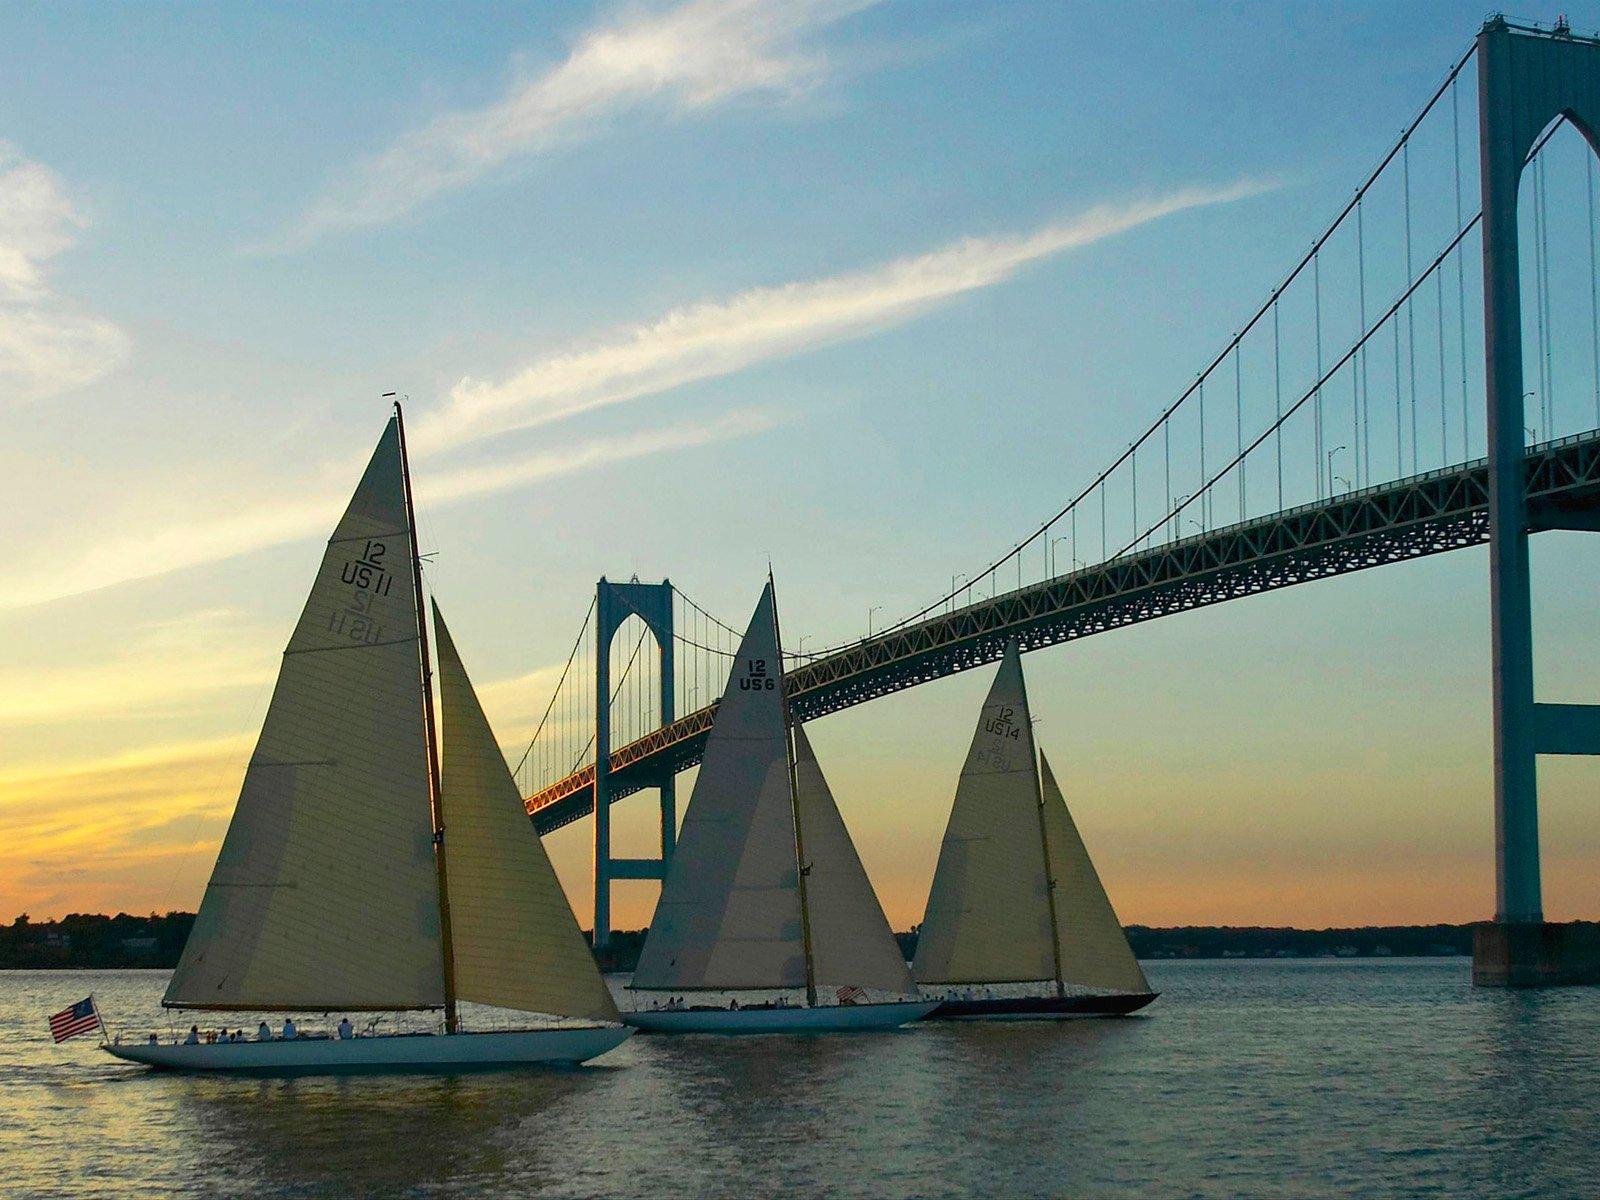 Yachts Sailing Under the Newport Bridge at Sunset Rhode Island 1600x1200